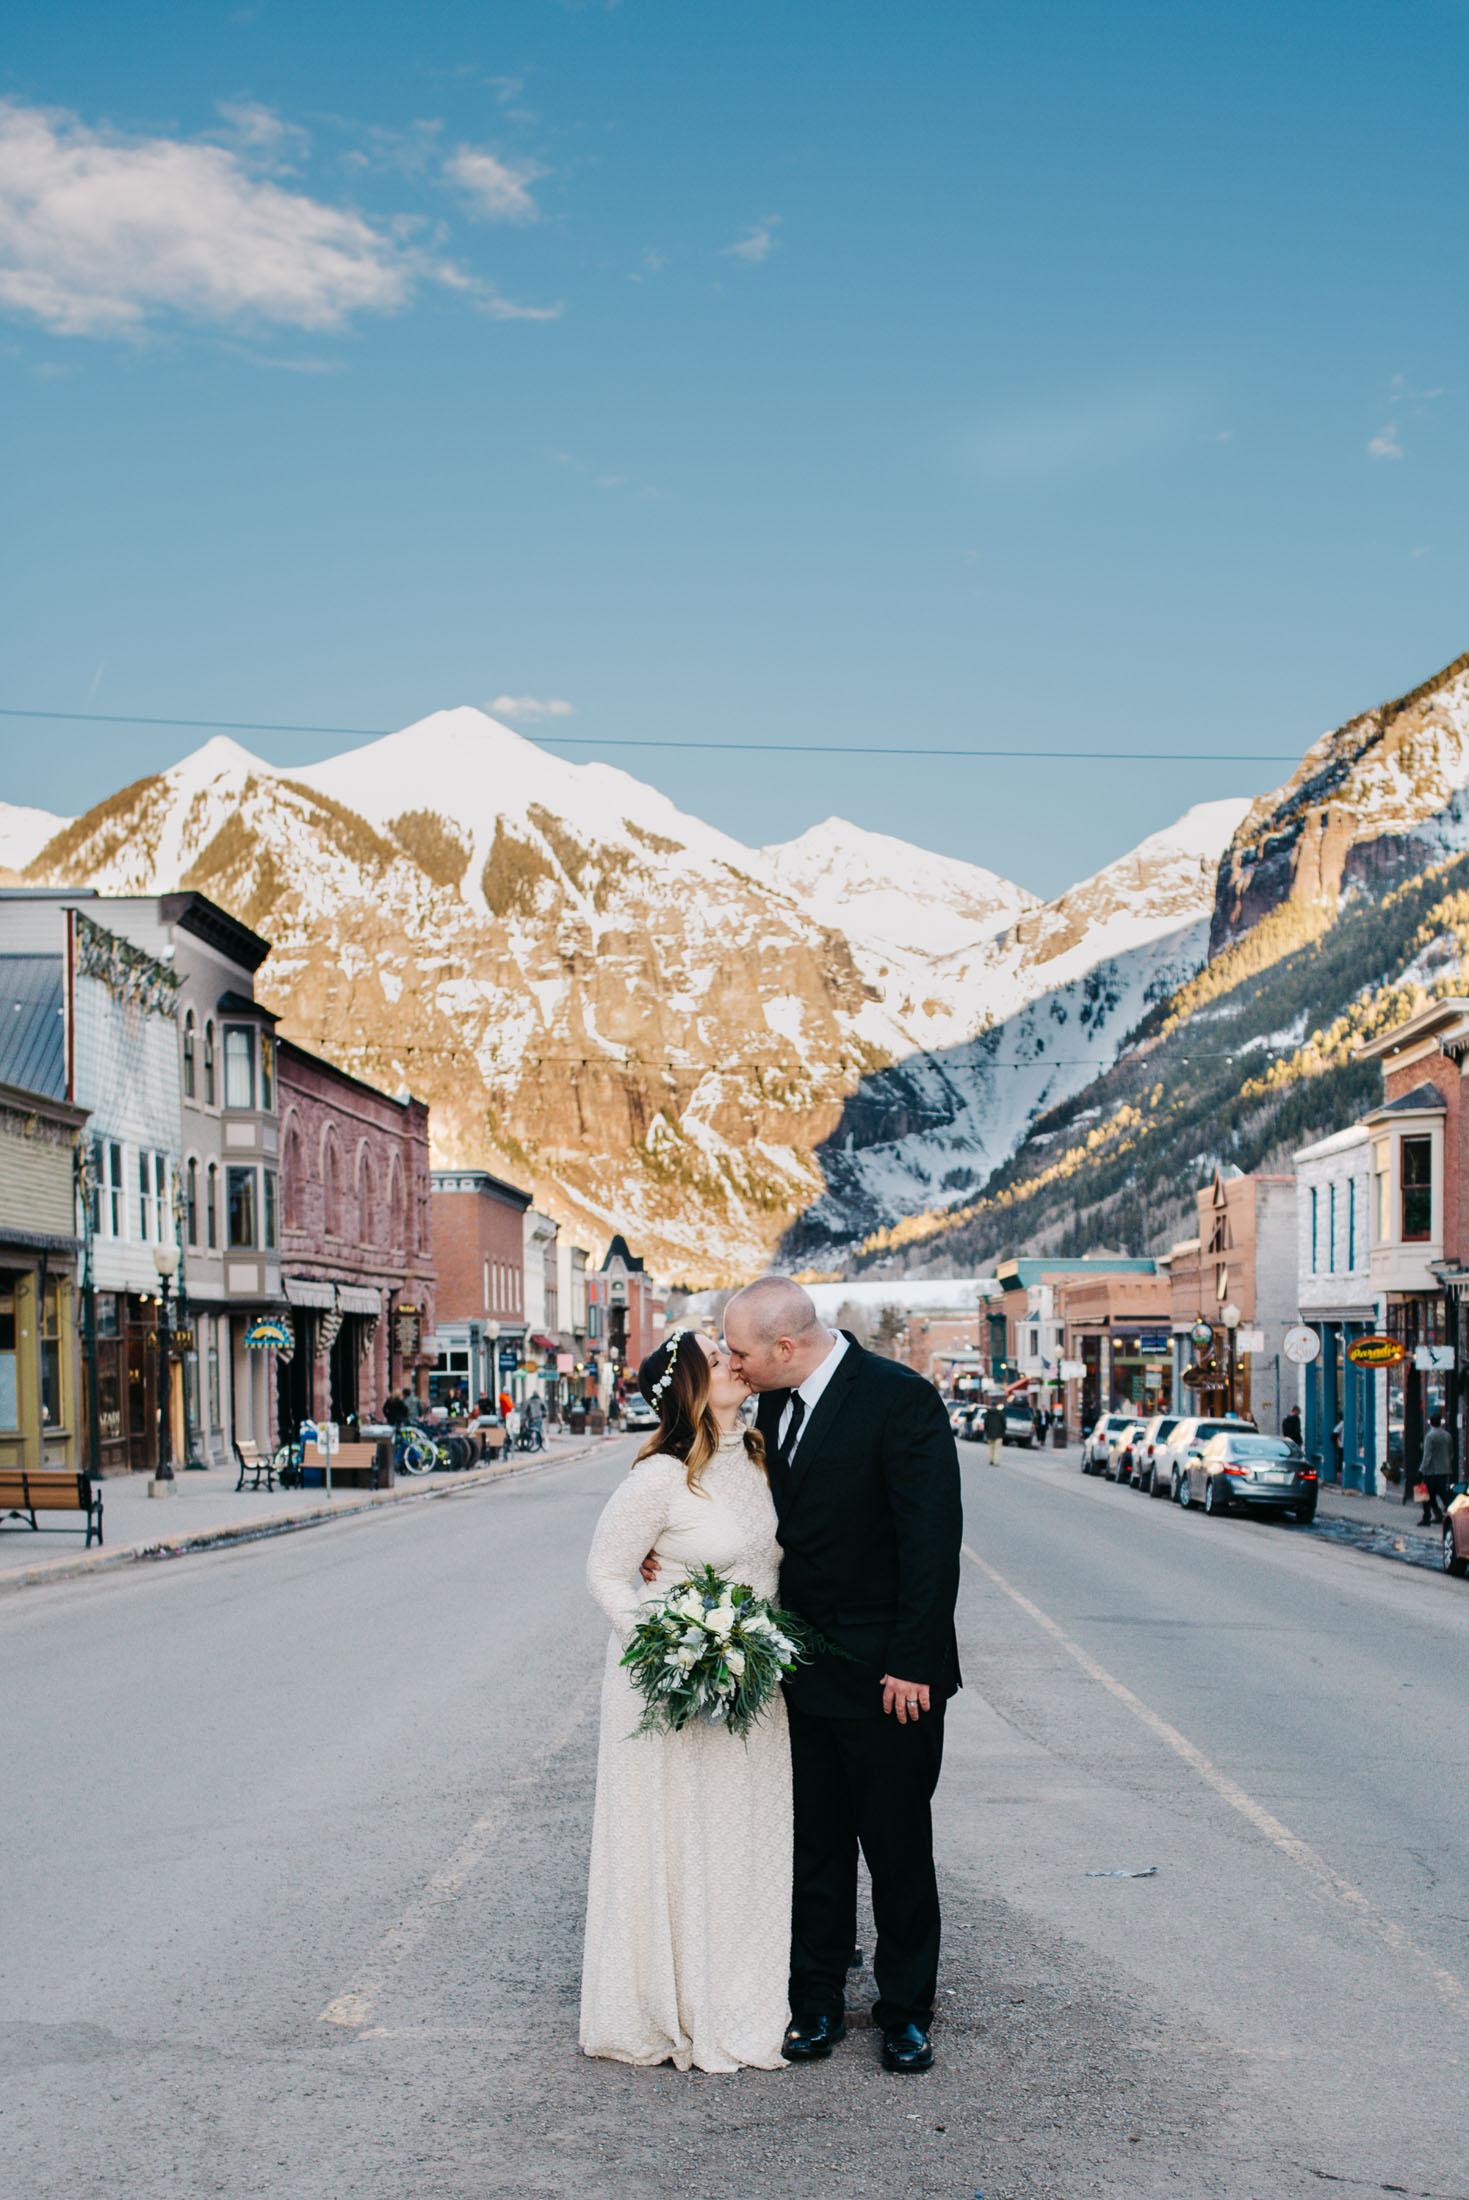 104elopement-photographer-colorado-telluride-winter-wedding-mountain-wedding-photographer-paige&chad-0937-2.jpg